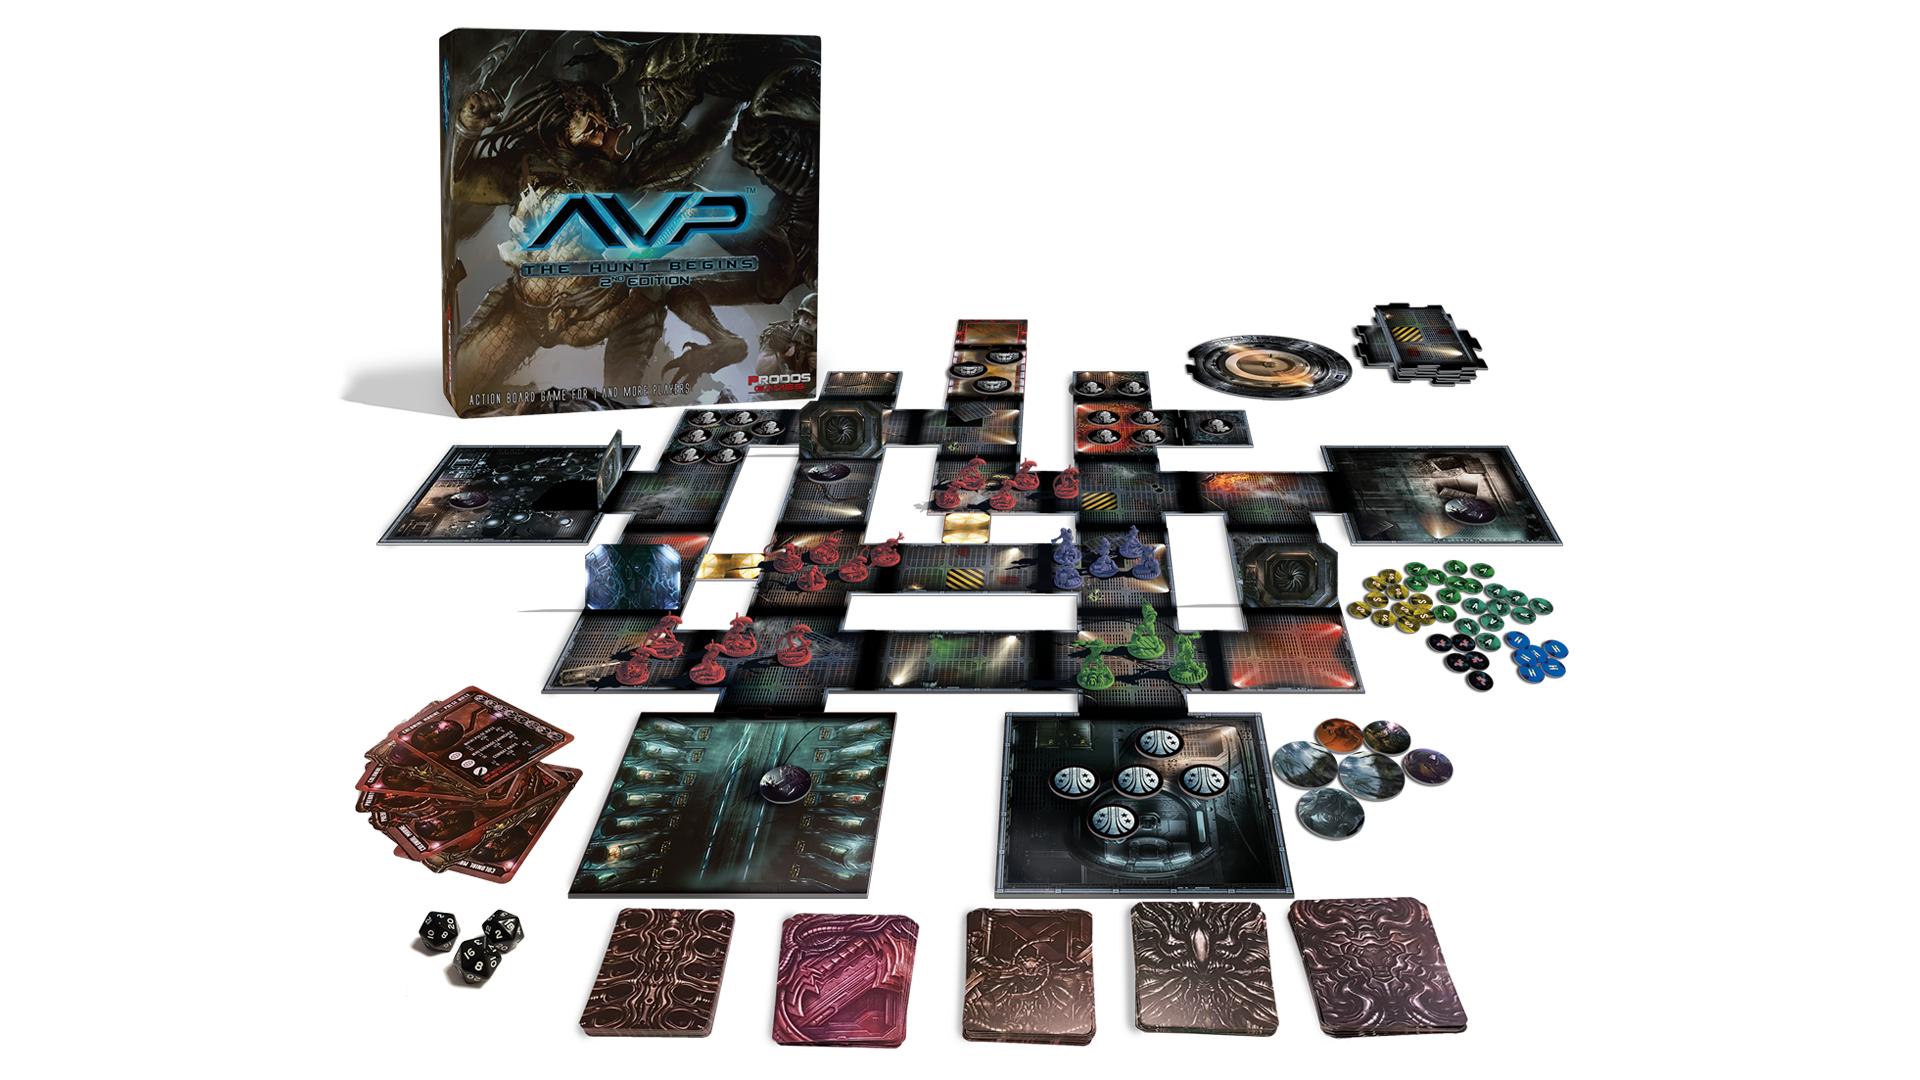 Alien vs Predator: The Hunt Begins movie board game box and gameplay layout